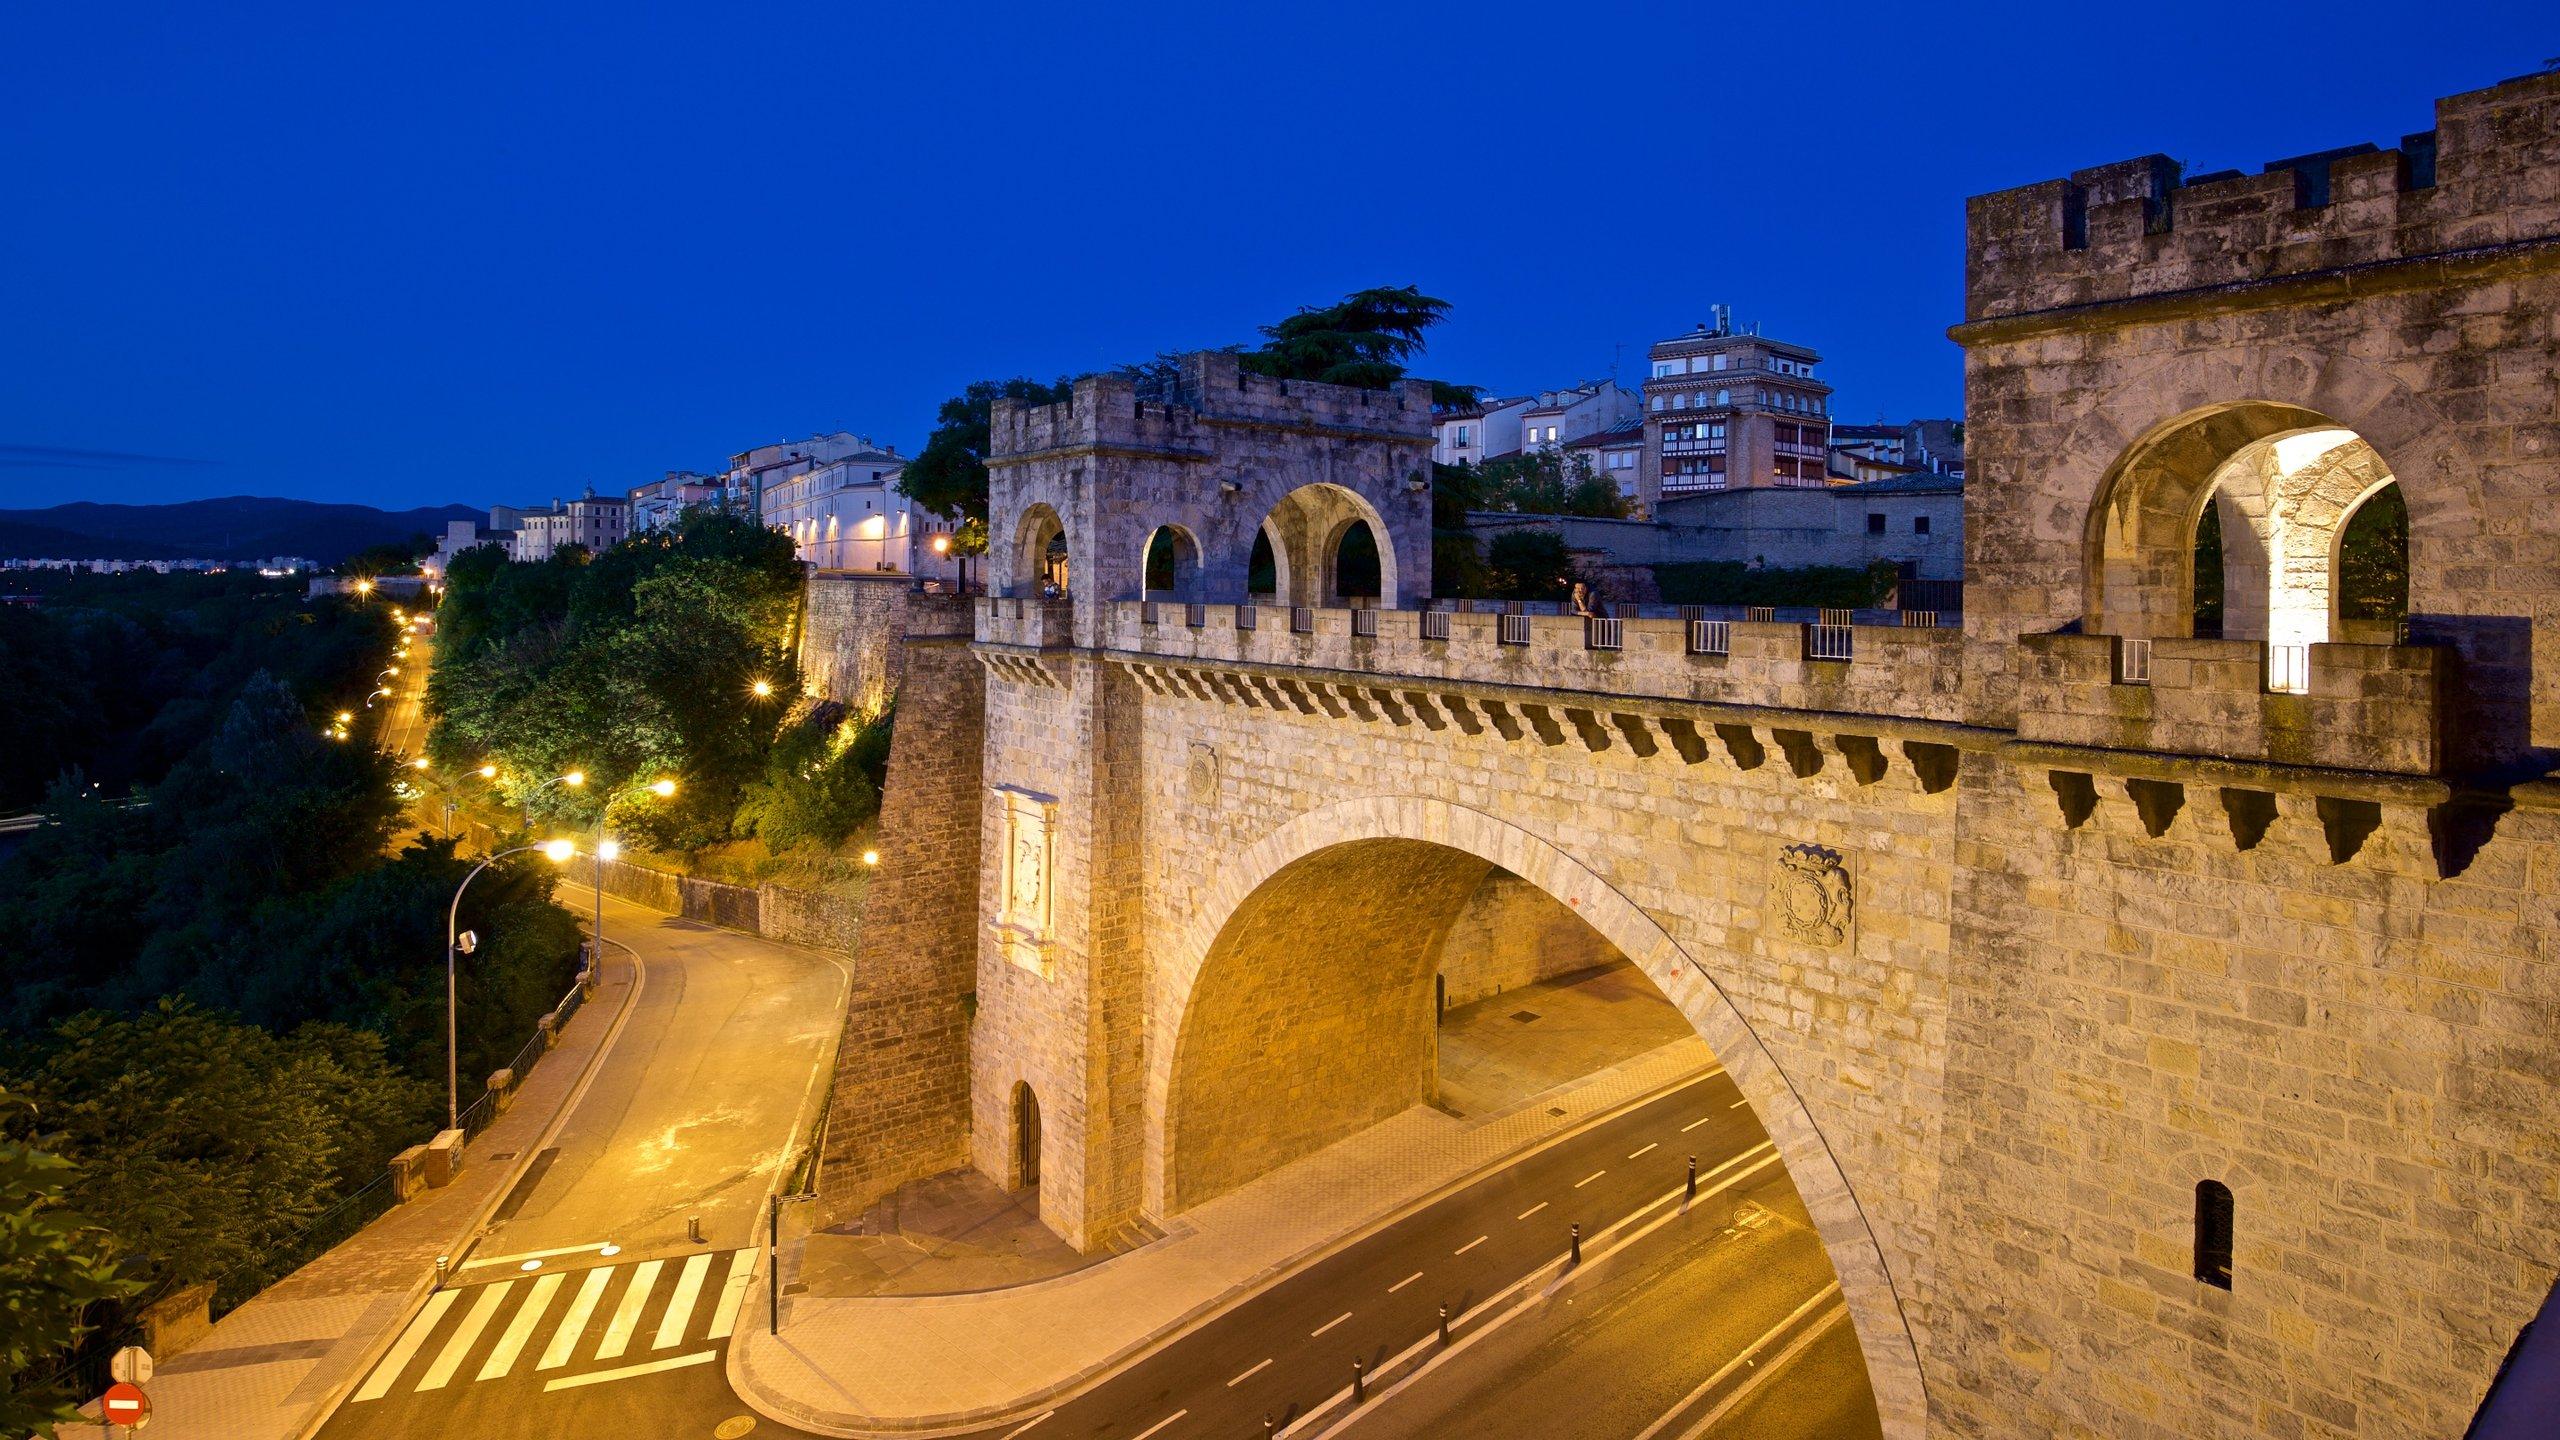 Pamplona's City Walls and Interpretation Centre, Pamplona, Navarre, Spain